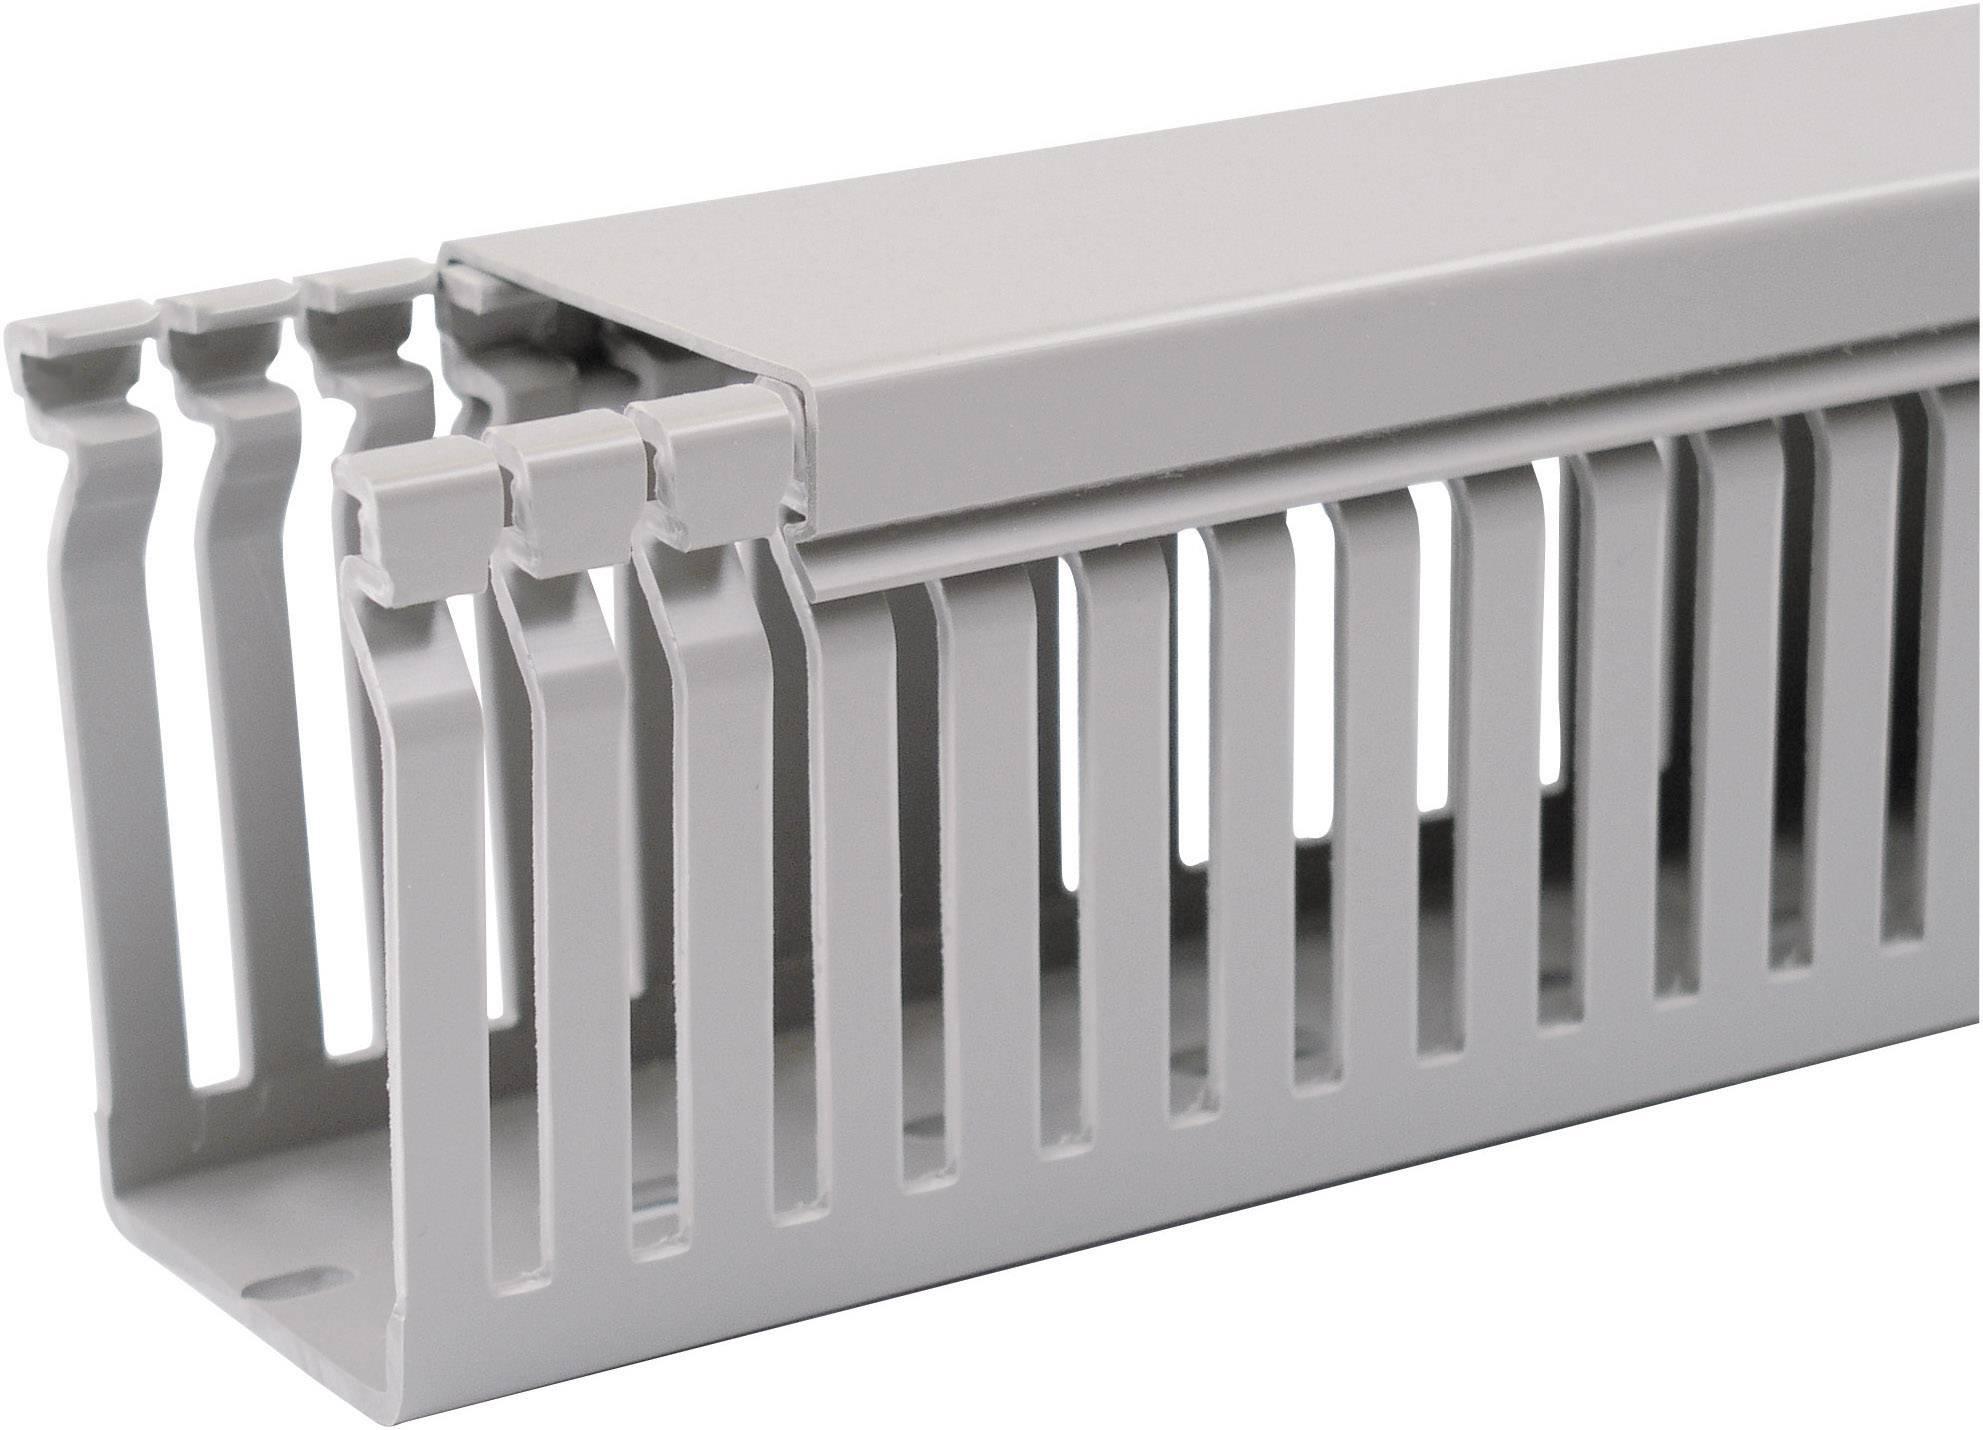 Elektroinstalační lišta OBO Bettermann, 6178005, 25 x 30 mm, 2 m, šedá